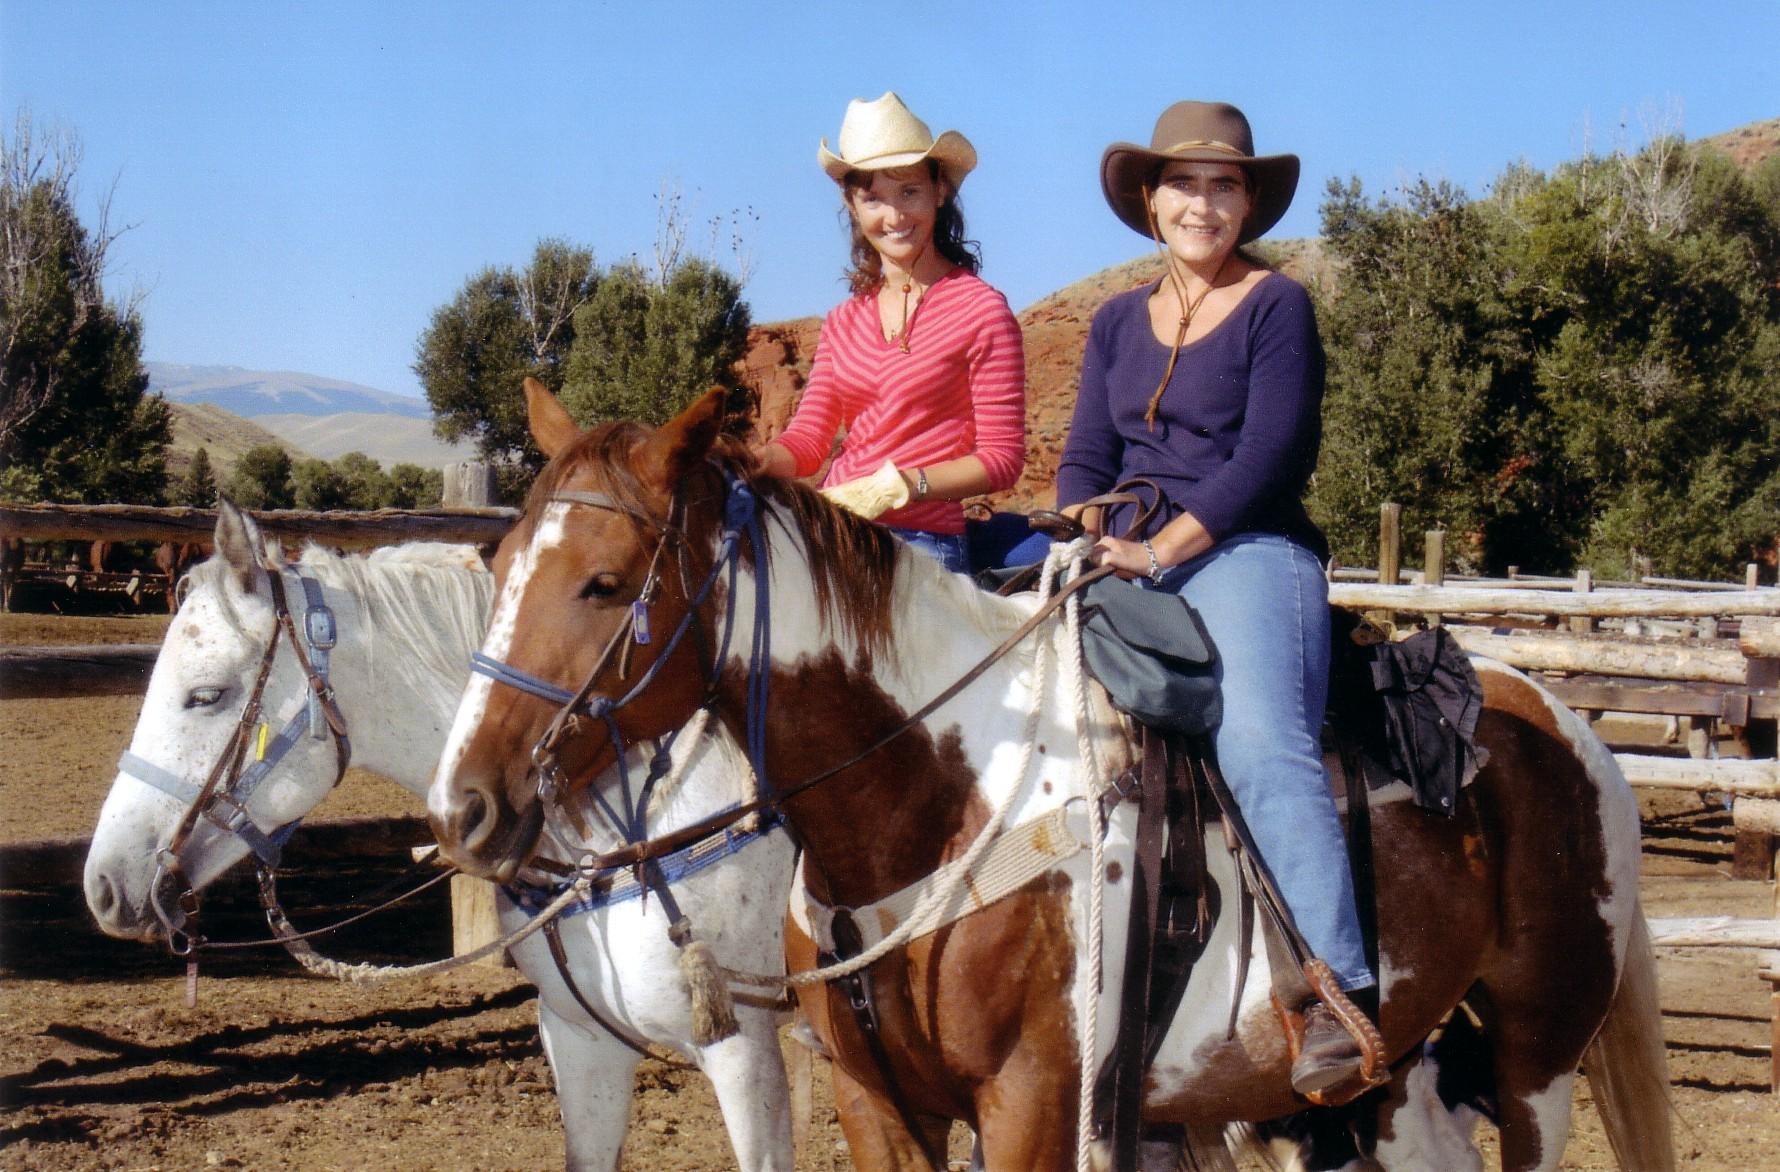 Drs. Heike Wulff and Christine Beeton in Wyoming, 2005